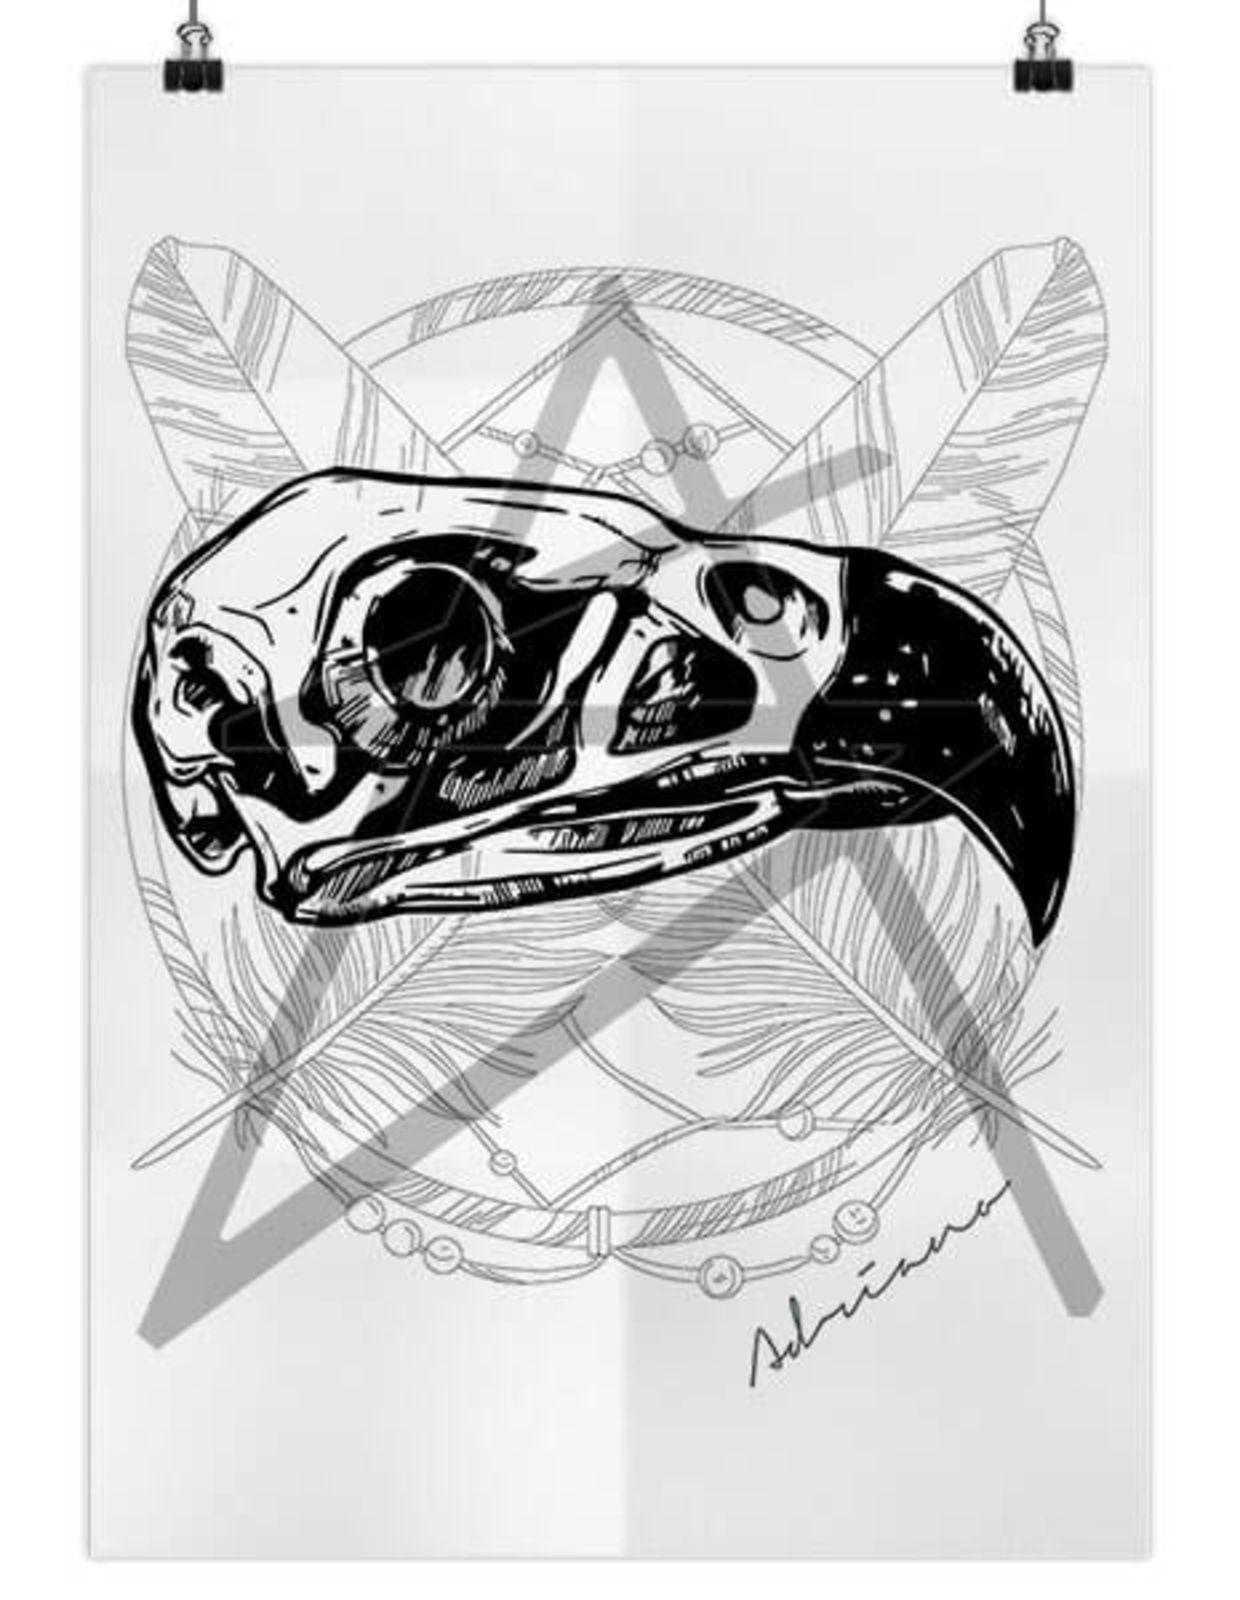 dd0de2a5d7 Camiseta Artseries Raglan Manga Curta Caveira Corvo Crow Branco ...